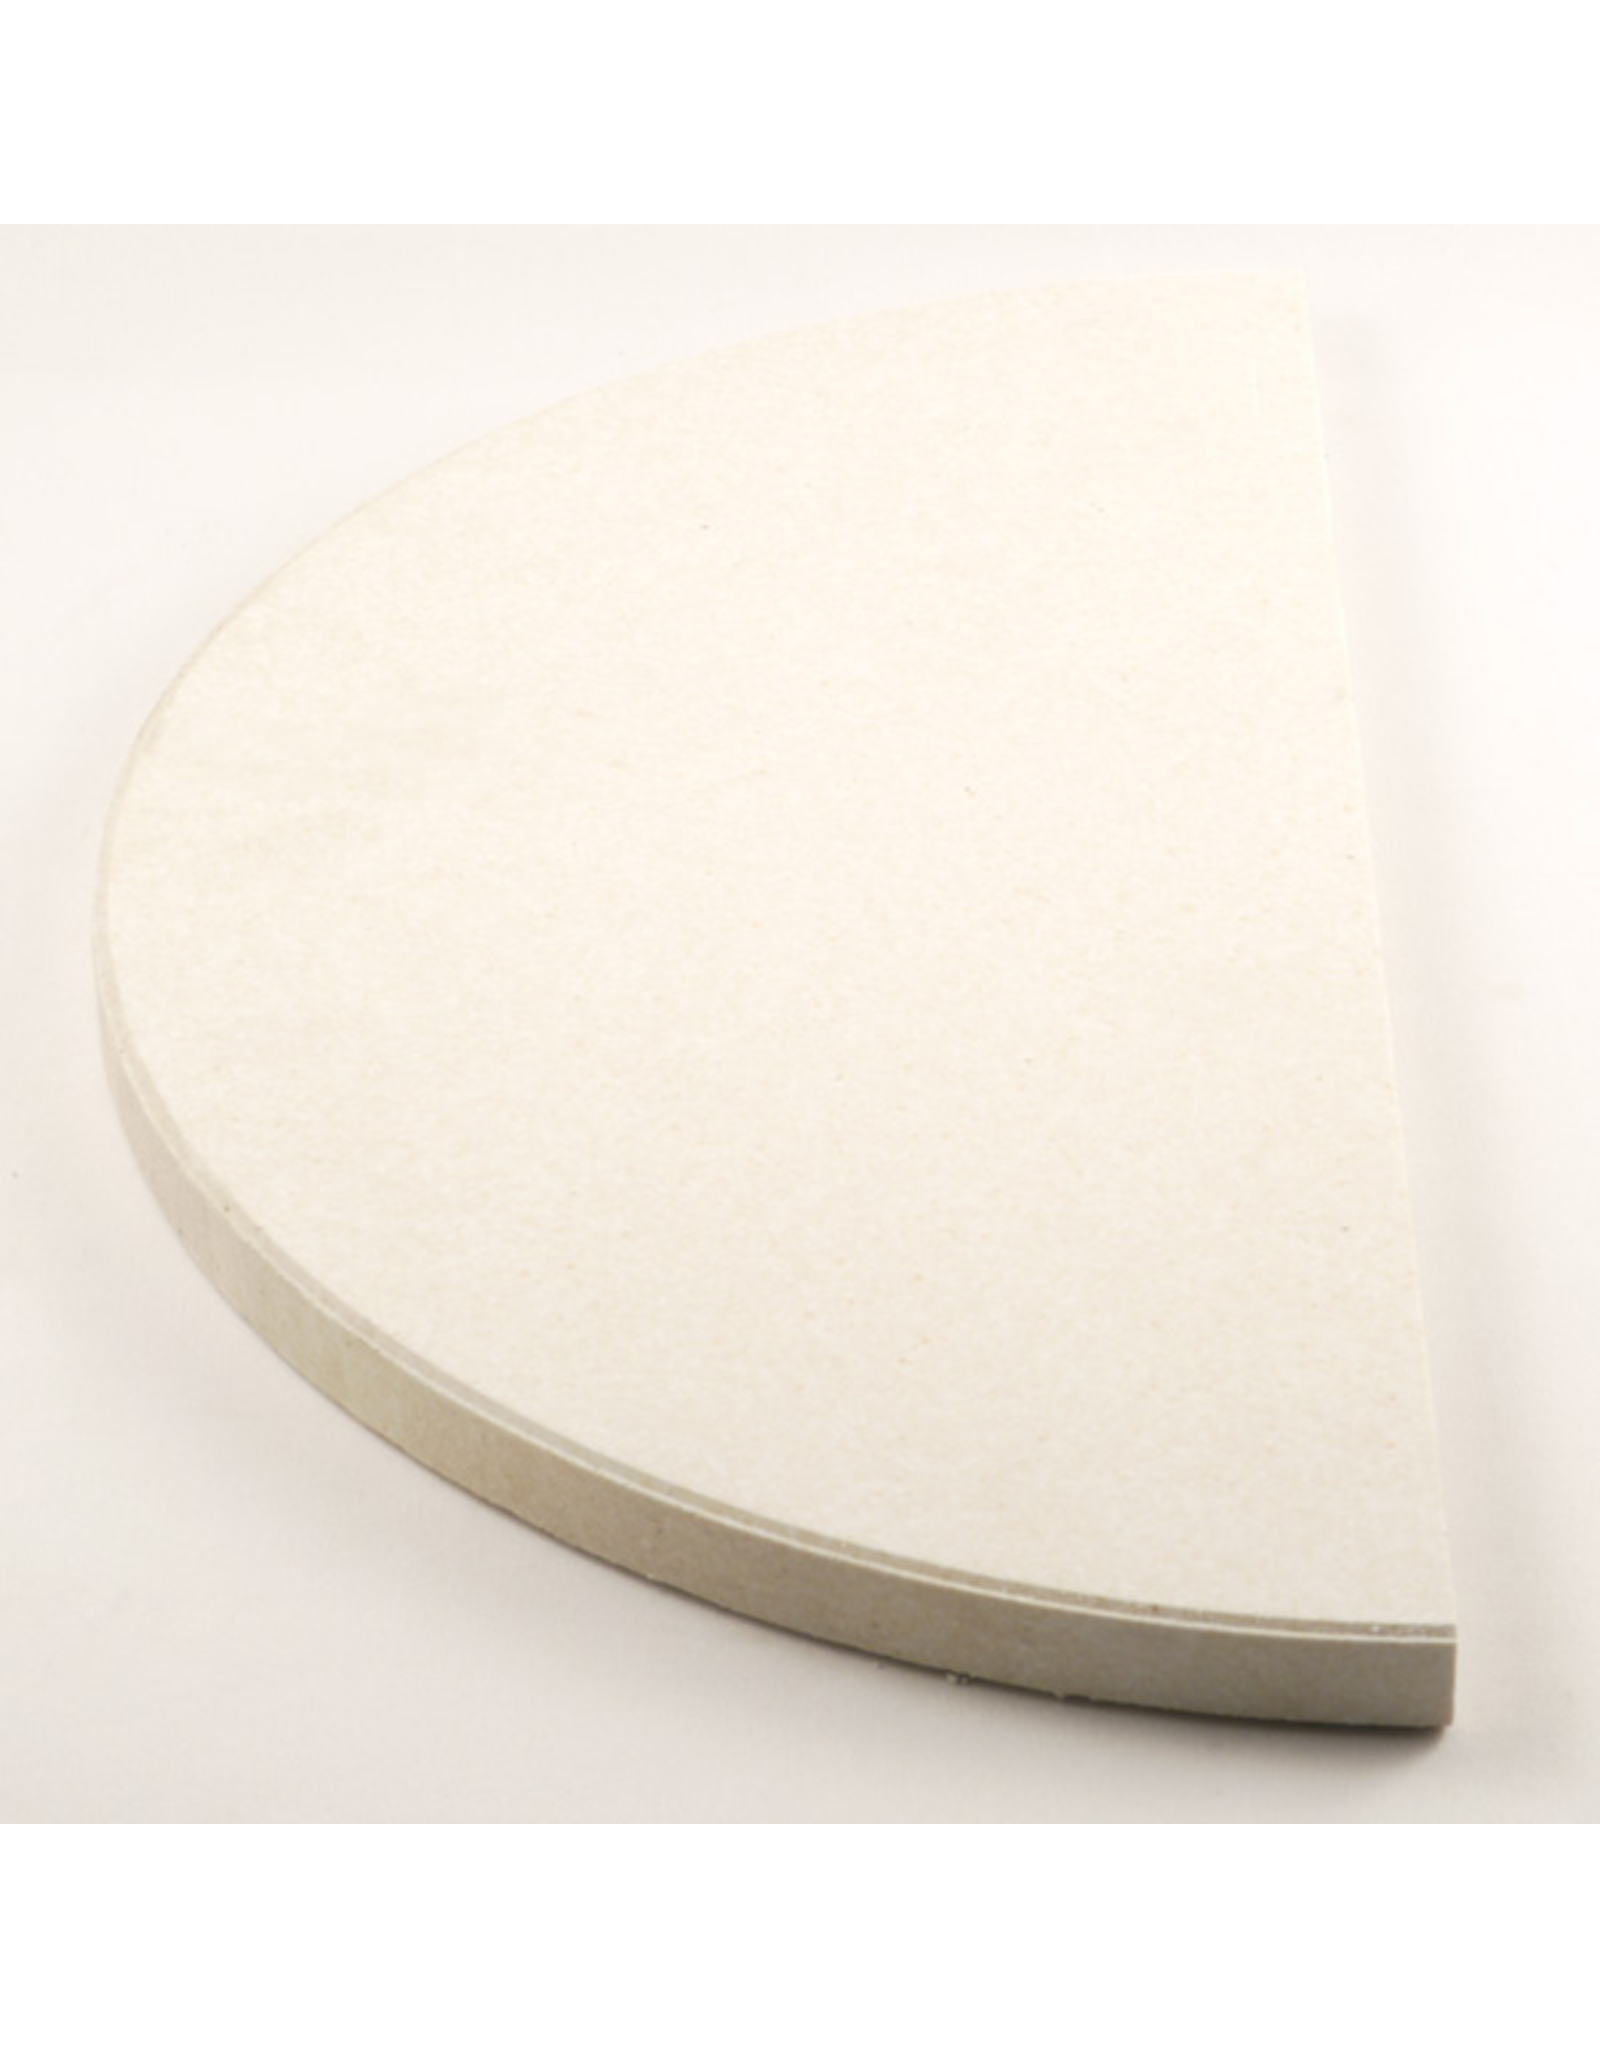 Semi Circle 39.4 x 1.6 cm Kiln Shelf